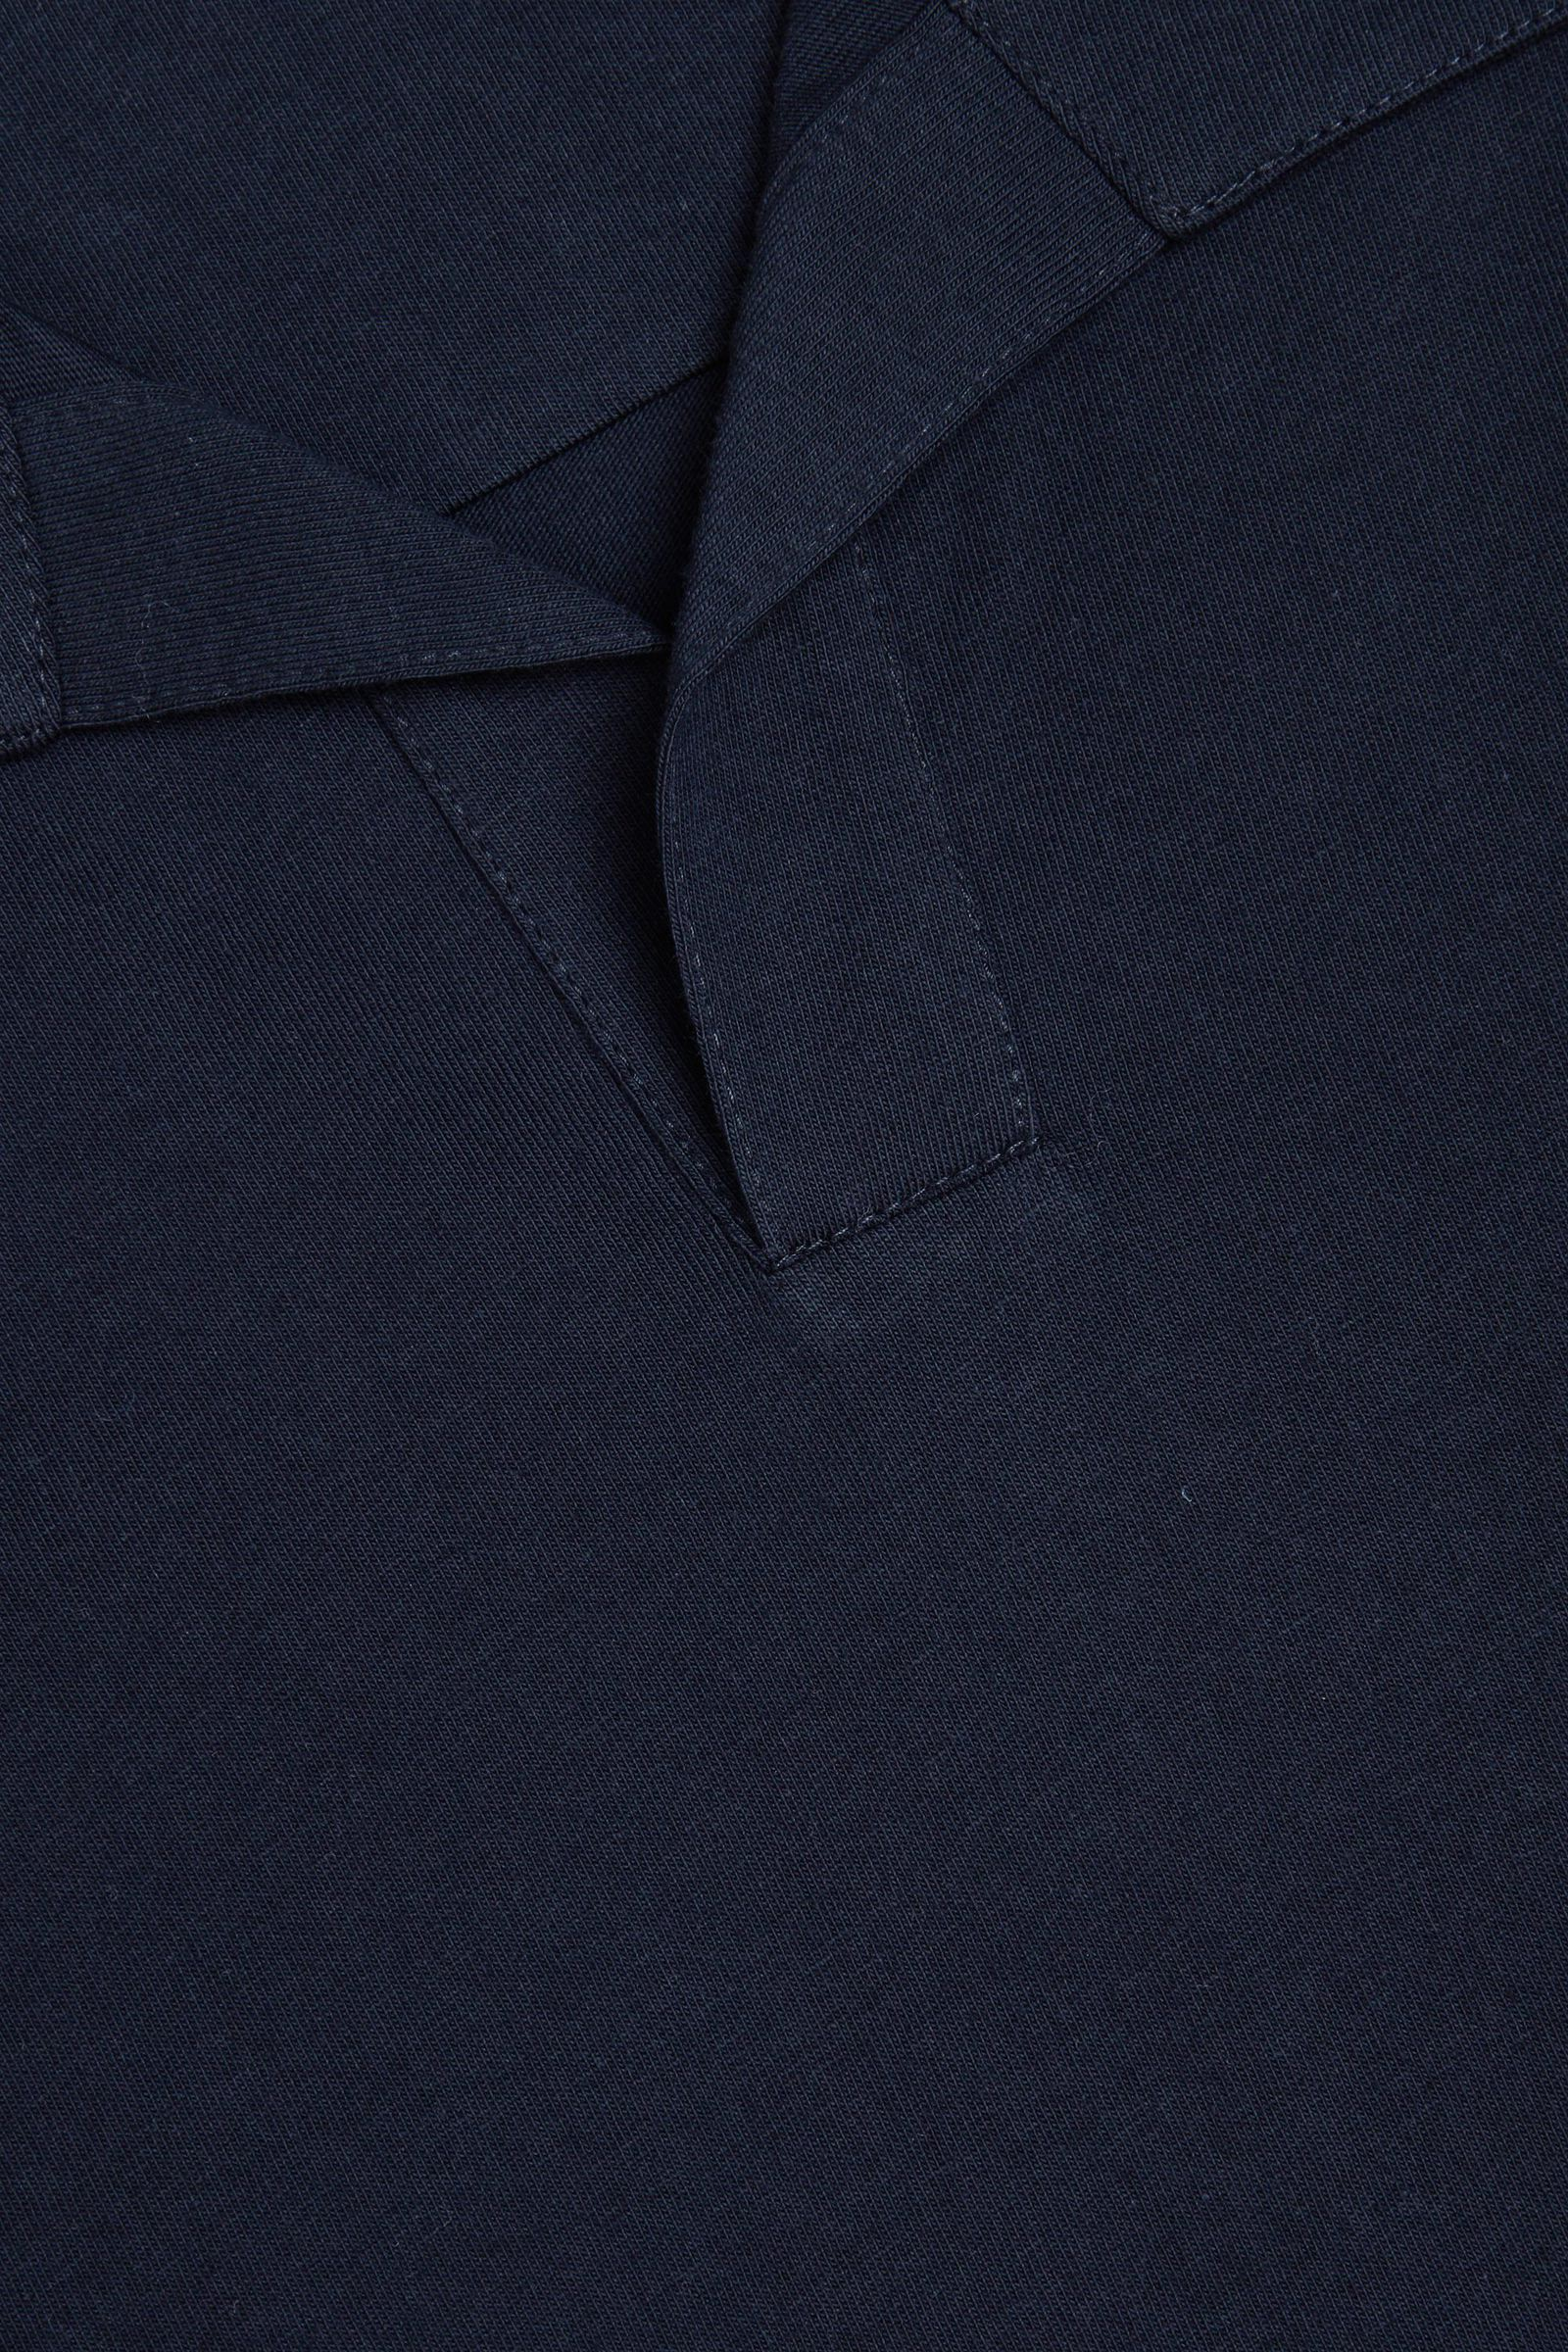 COS 오픈 칼라 코튼 폴로 셔츠의 네이비컬러 Detail입니다.